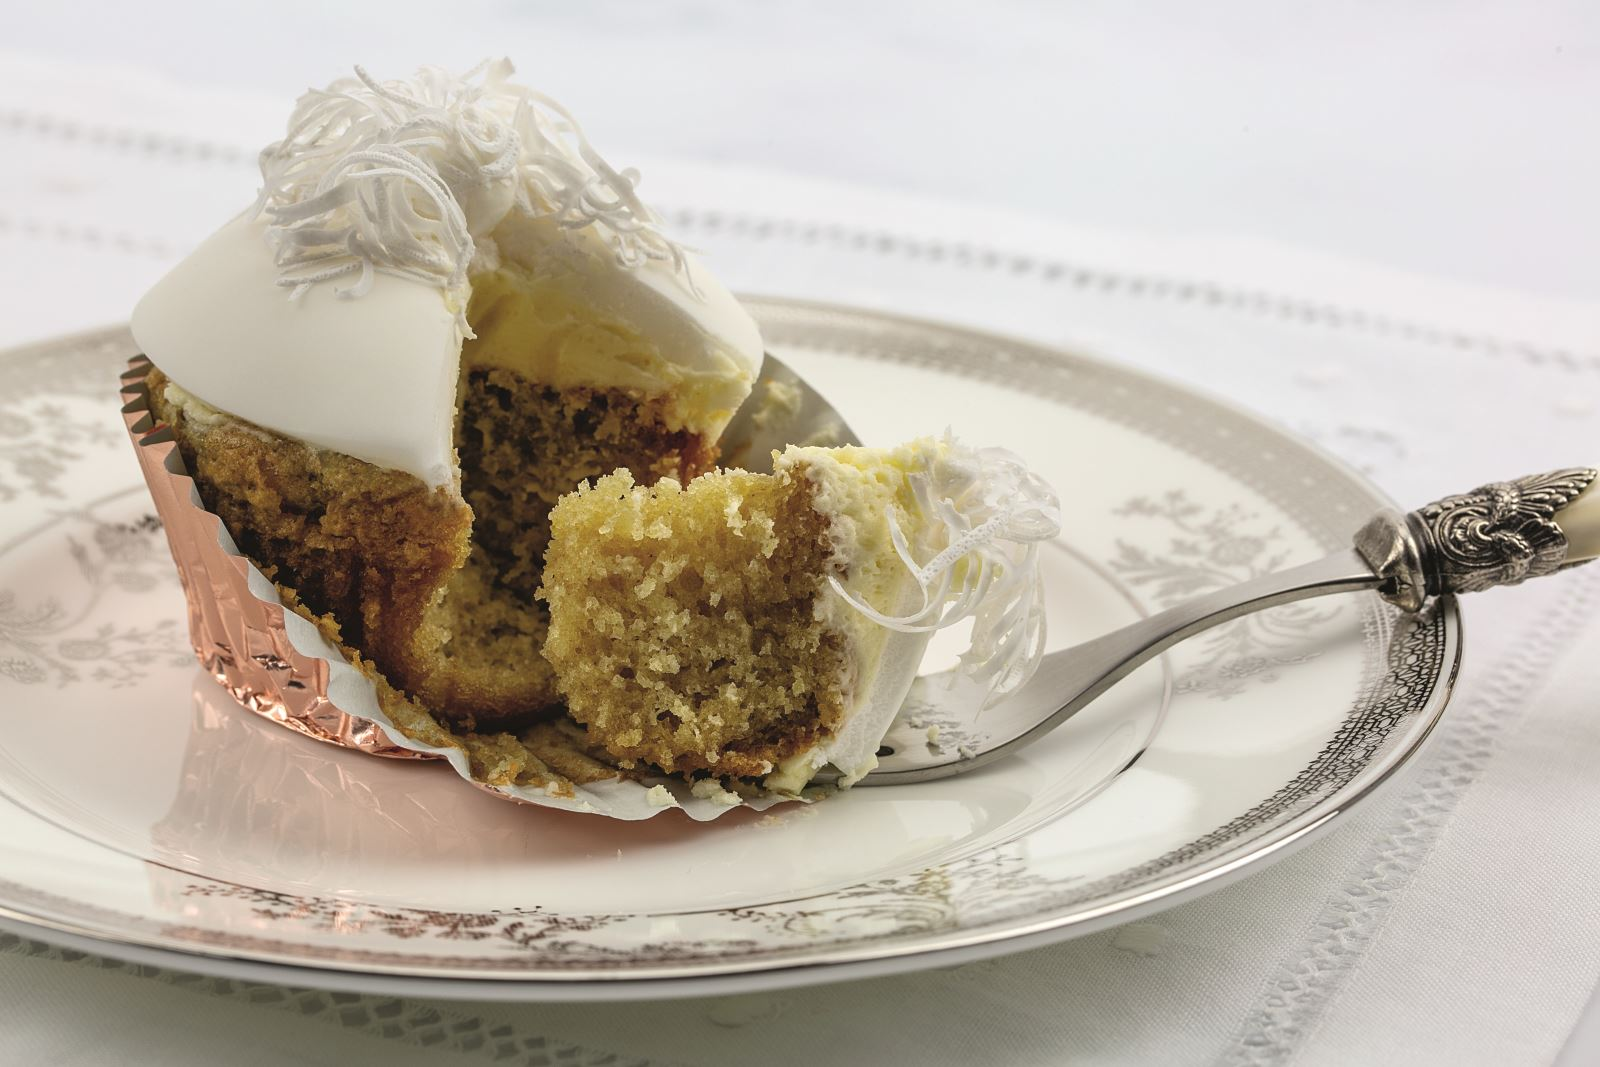 Cake Photography Tips: Expert Advice